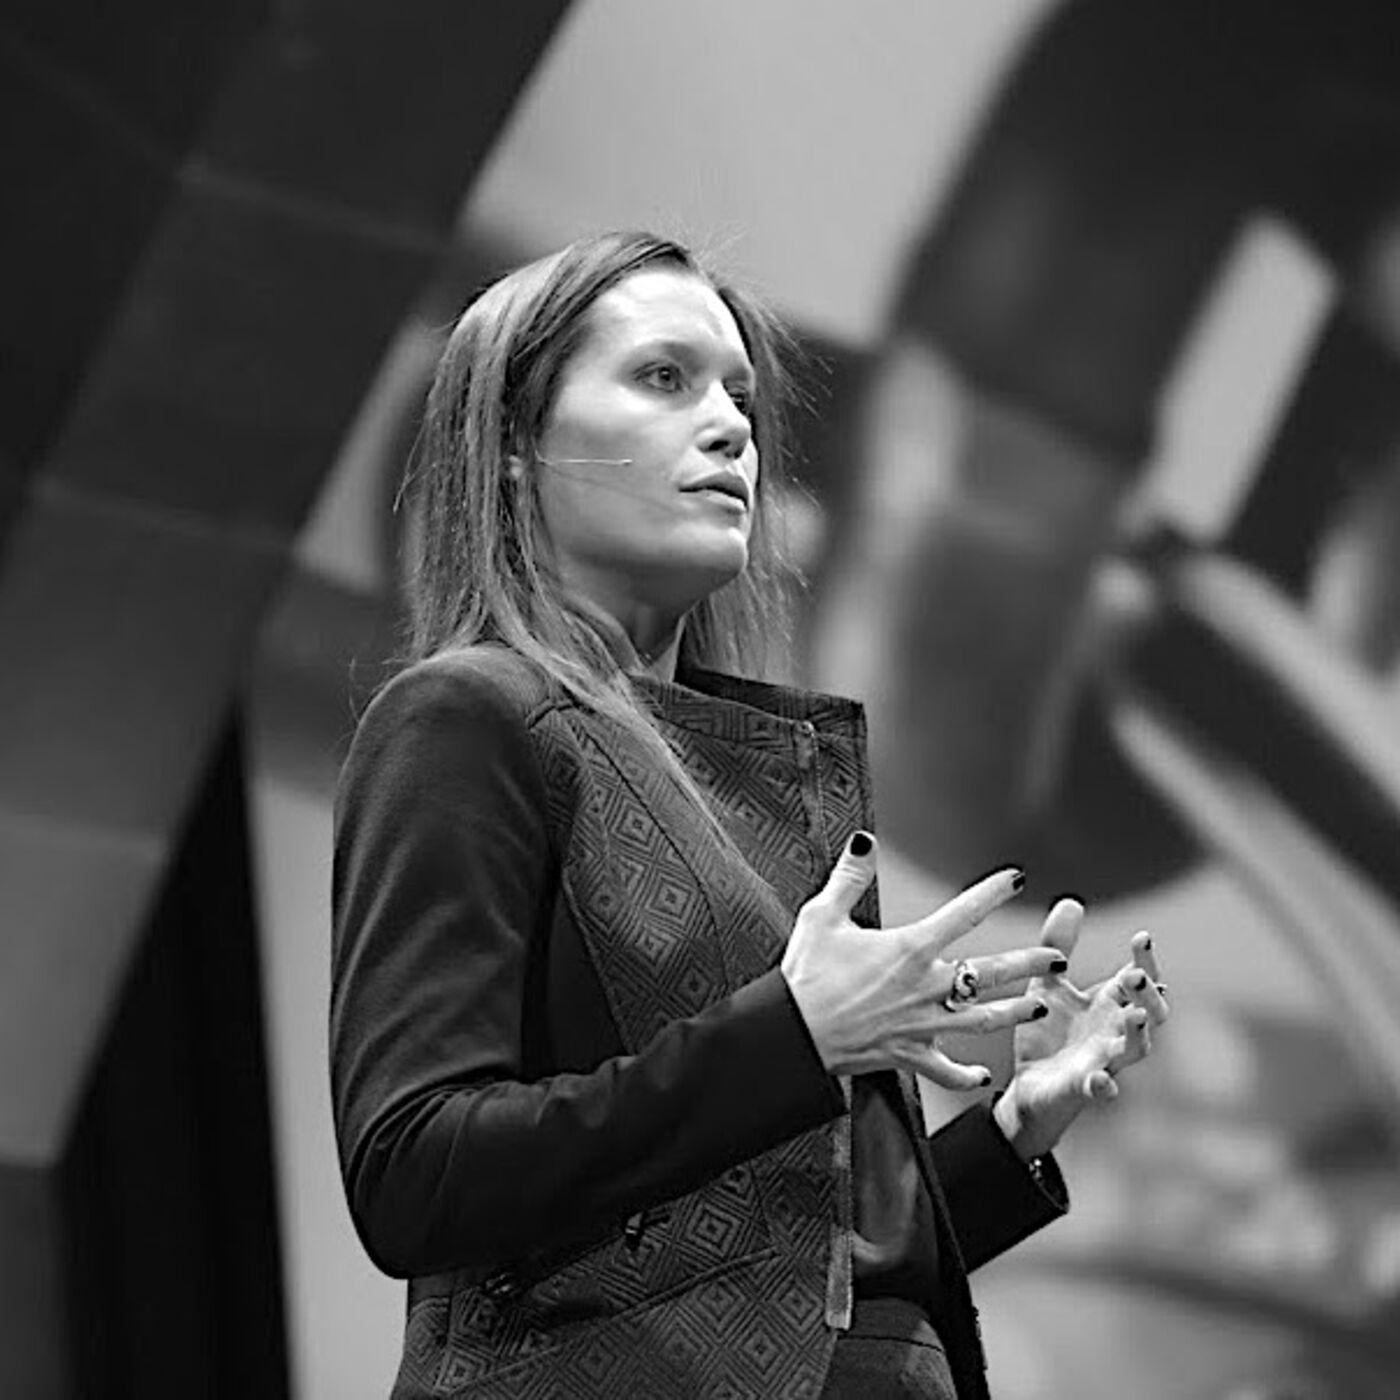 Professor Renee Knake